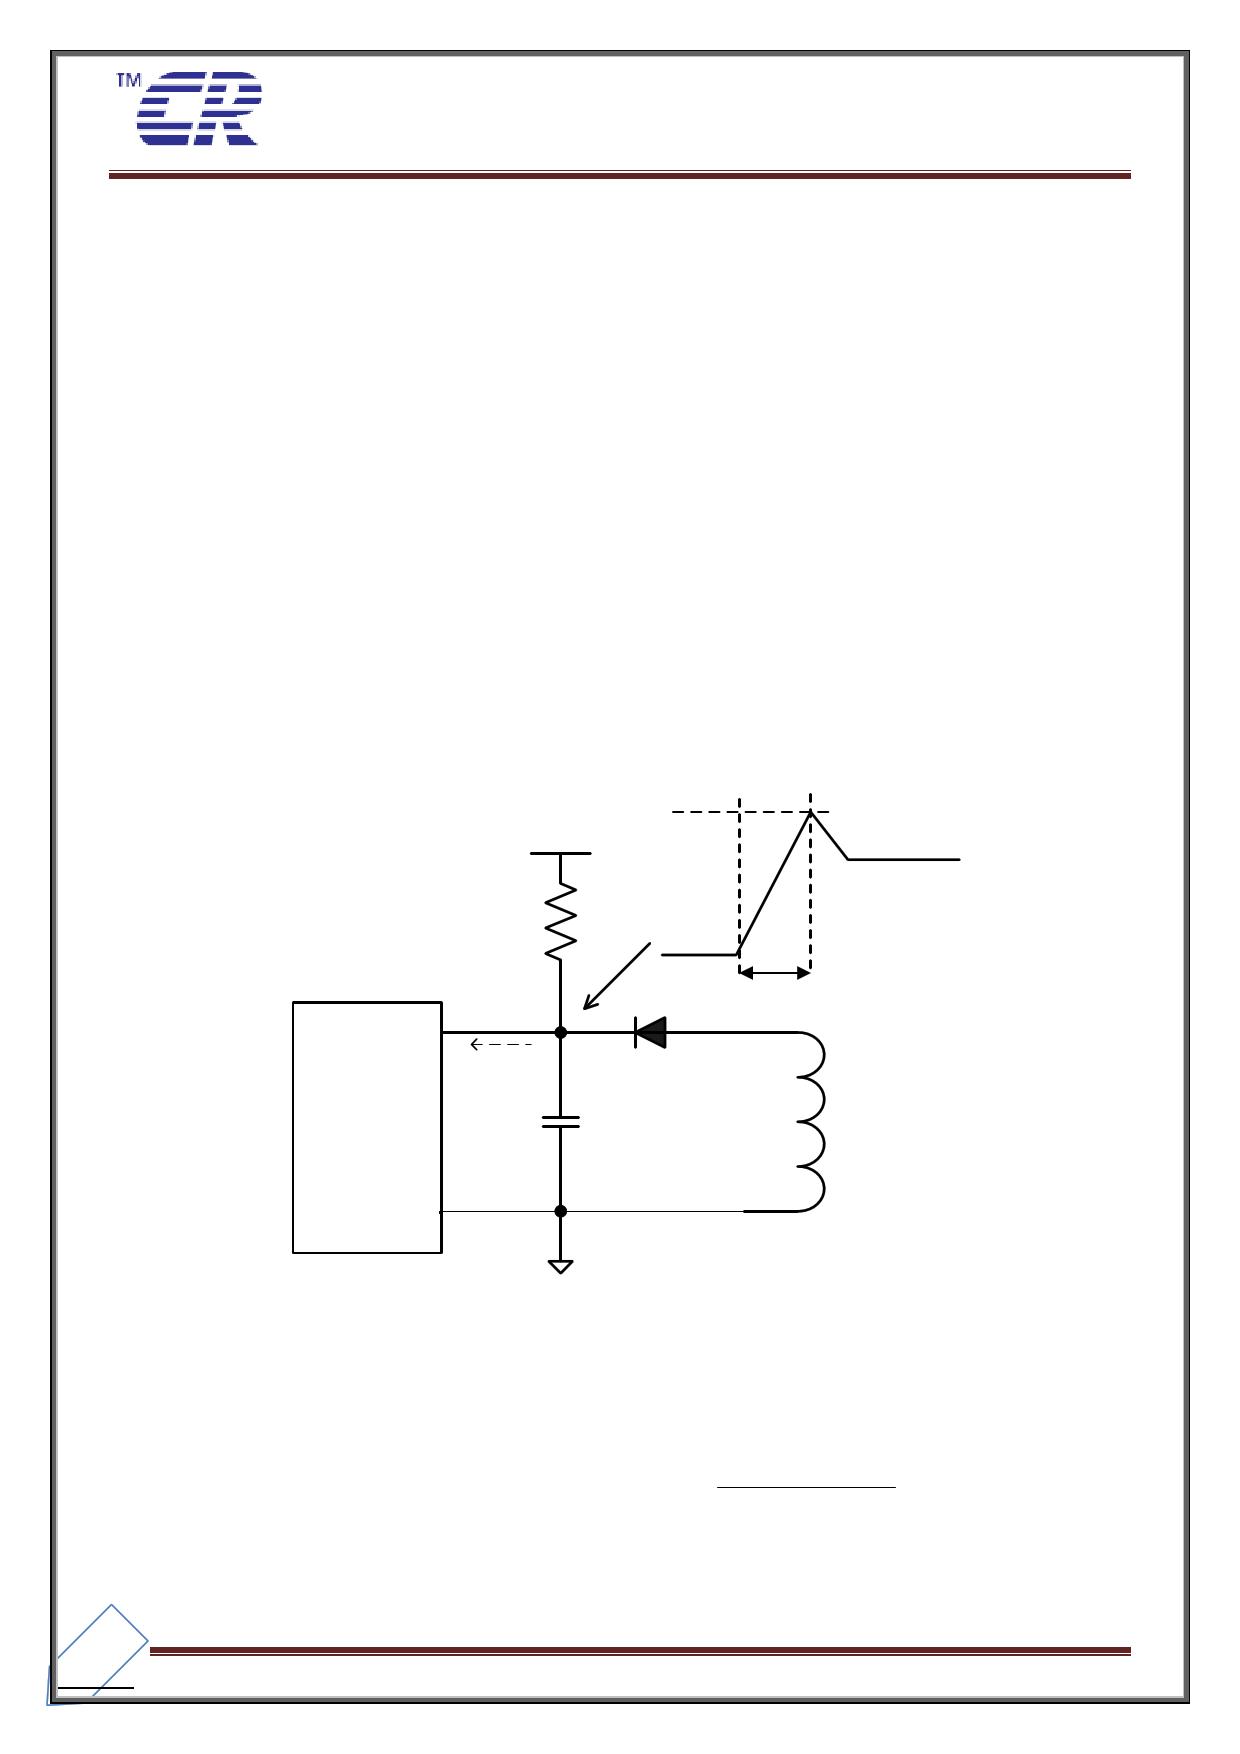 cr5229 datasheet pdf    u0434 u0430 u0442 u0430 u0448 u0438 u0442